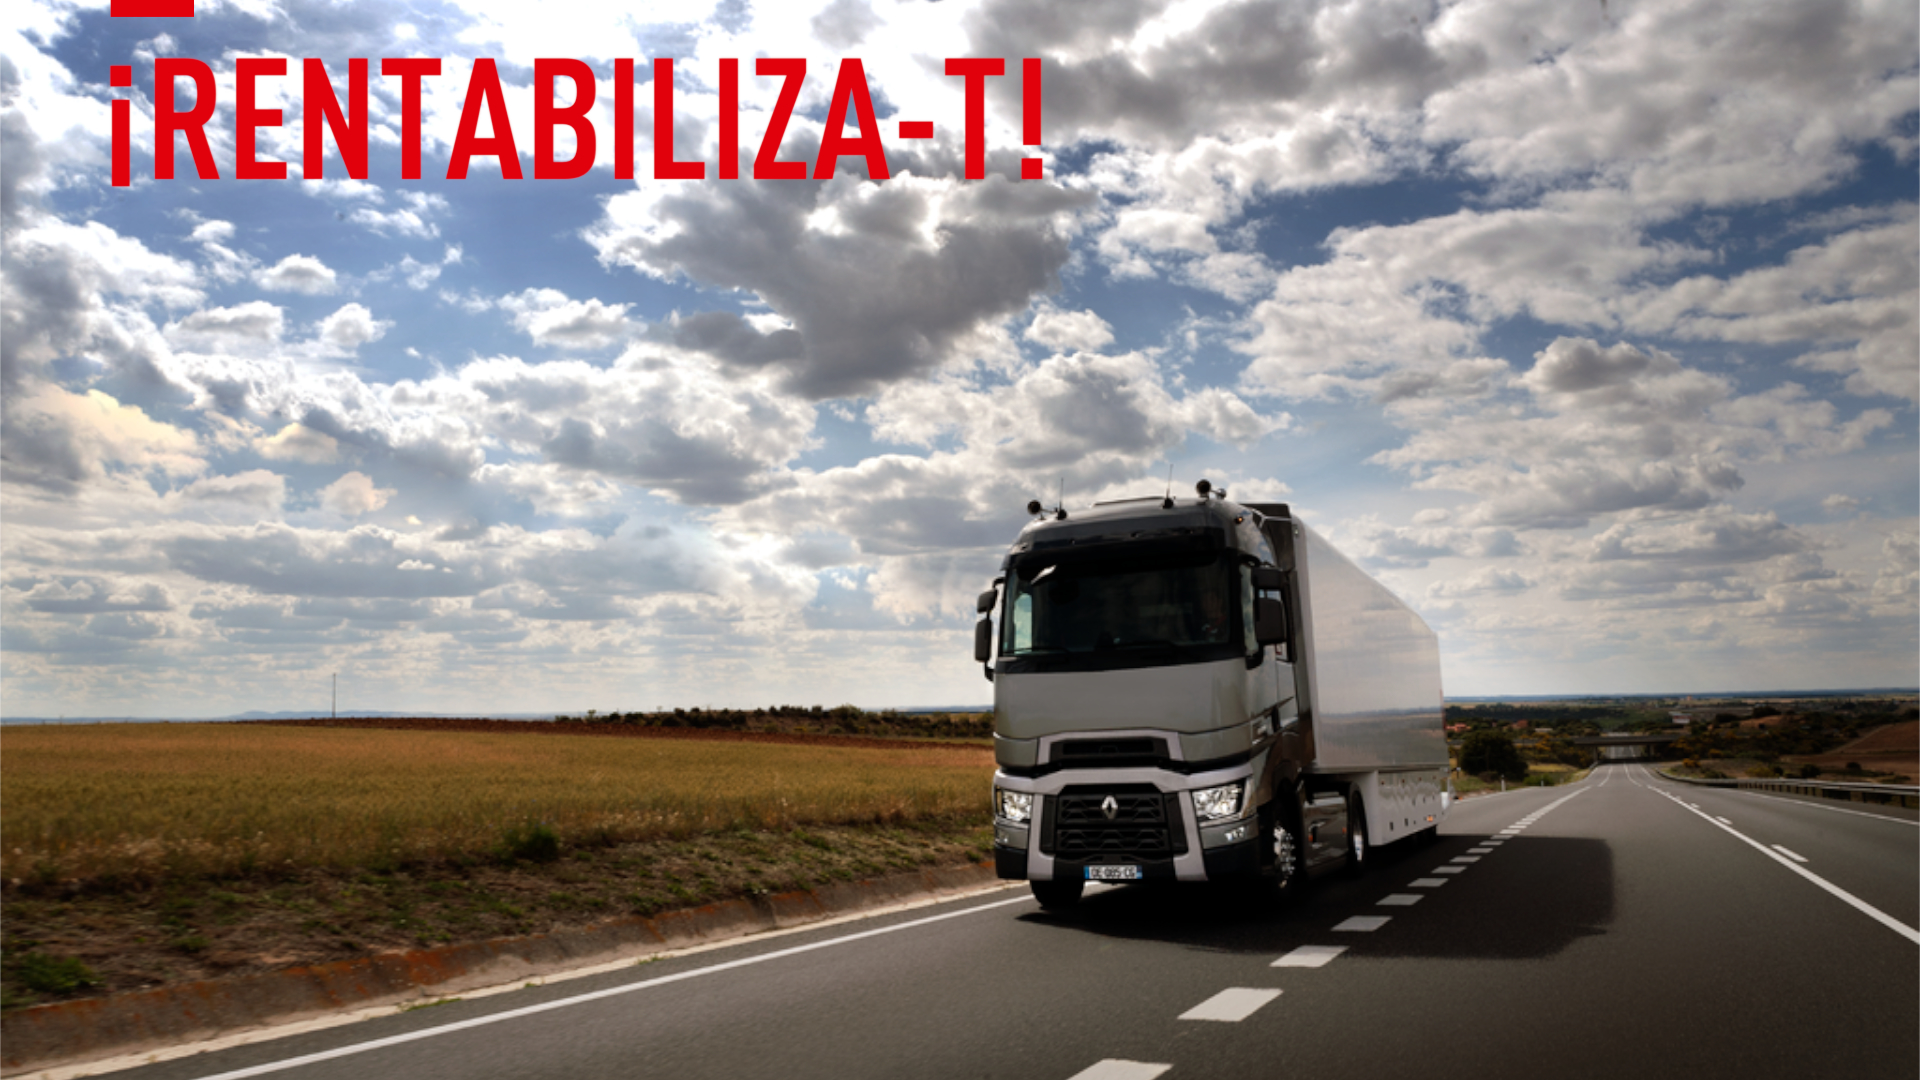 Renault Trucks Rentabiliza-T 1